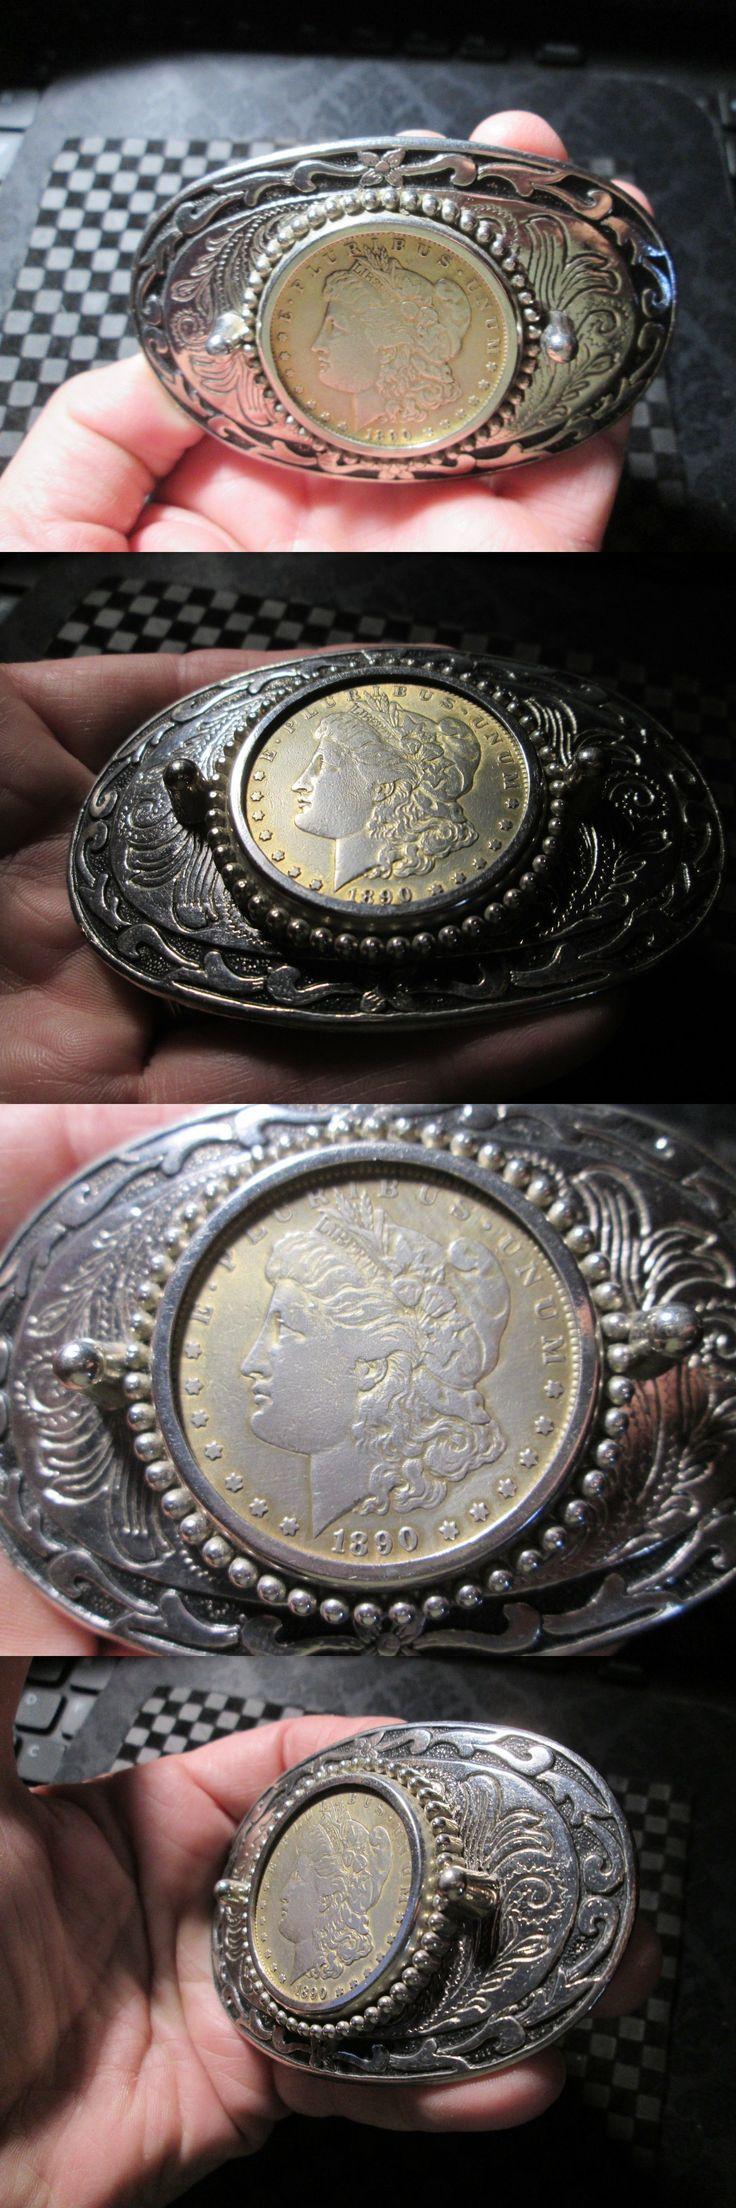 Bullion: Vintage Belt Buckle 1890 Morgan Silver Dollar Belt Buckle Deer Antlers -> BUY IT NOW ONLY: $65 on eBay!